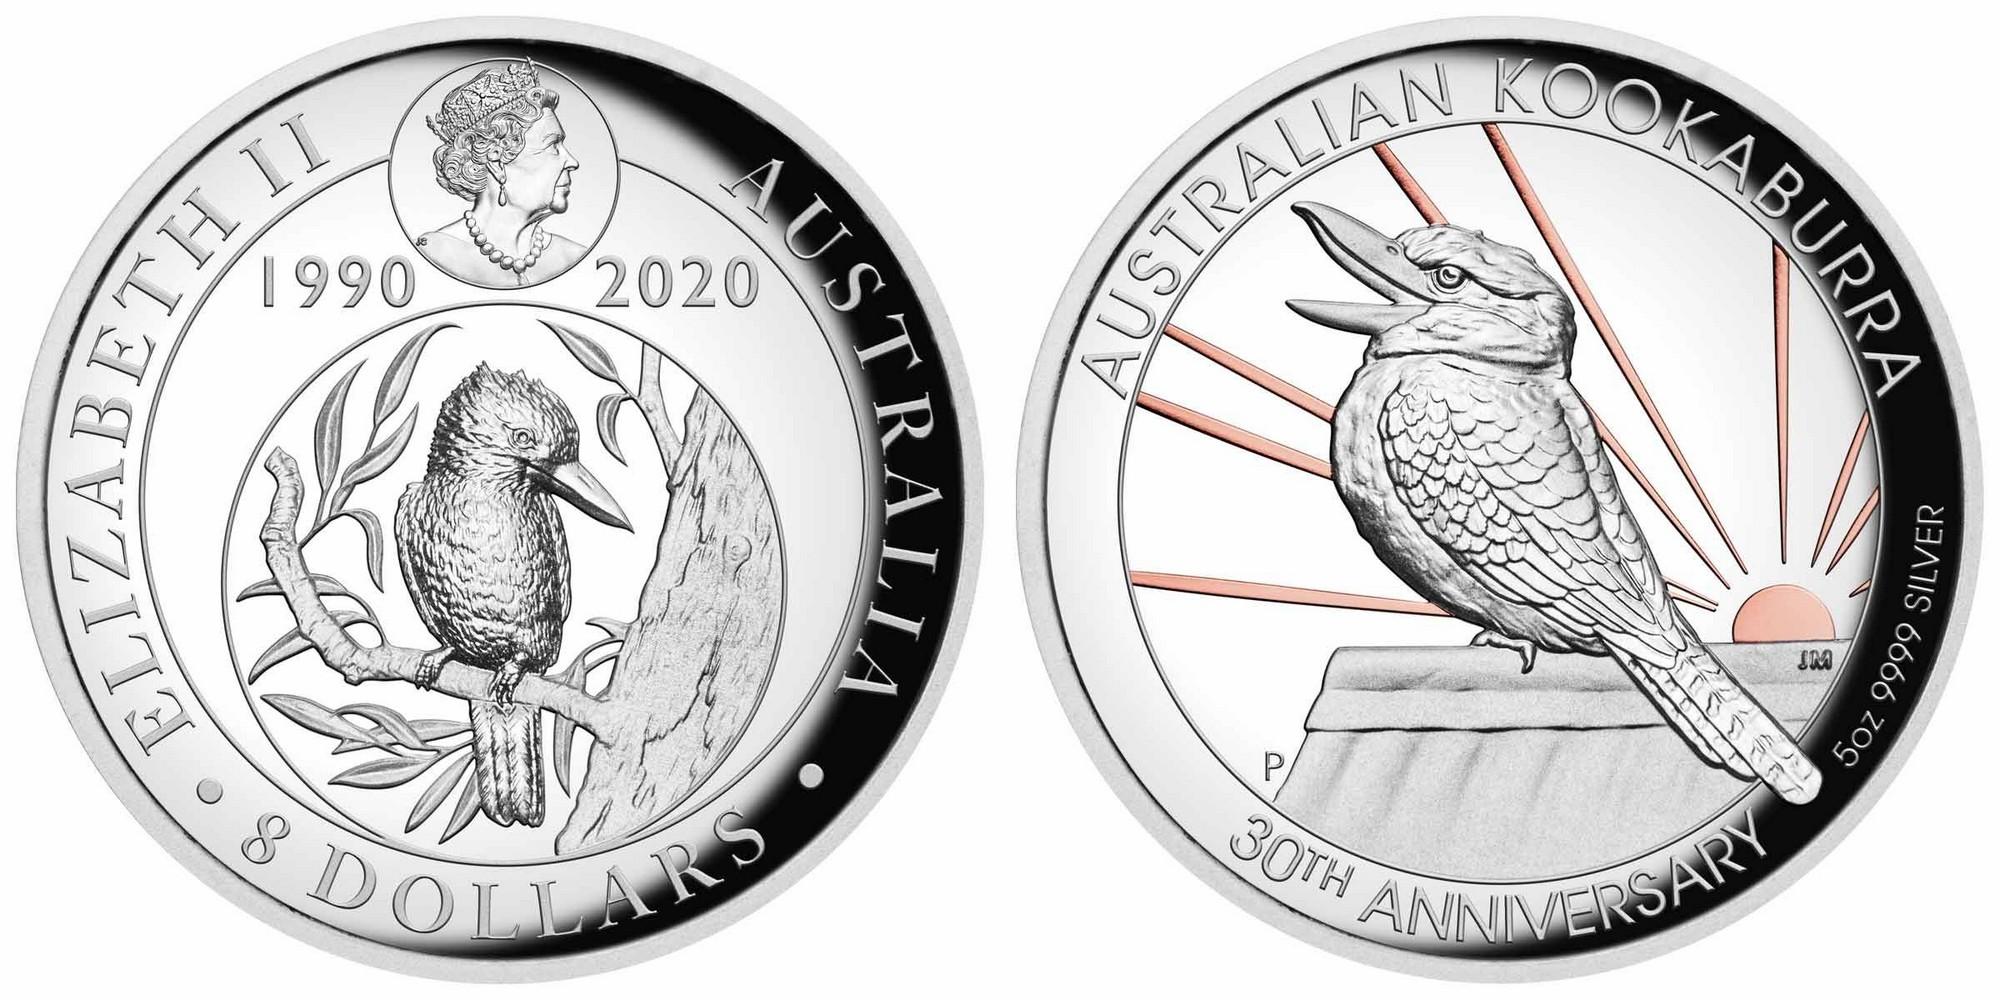 australie-2020-30-ans-du-kookaburra-5-oz